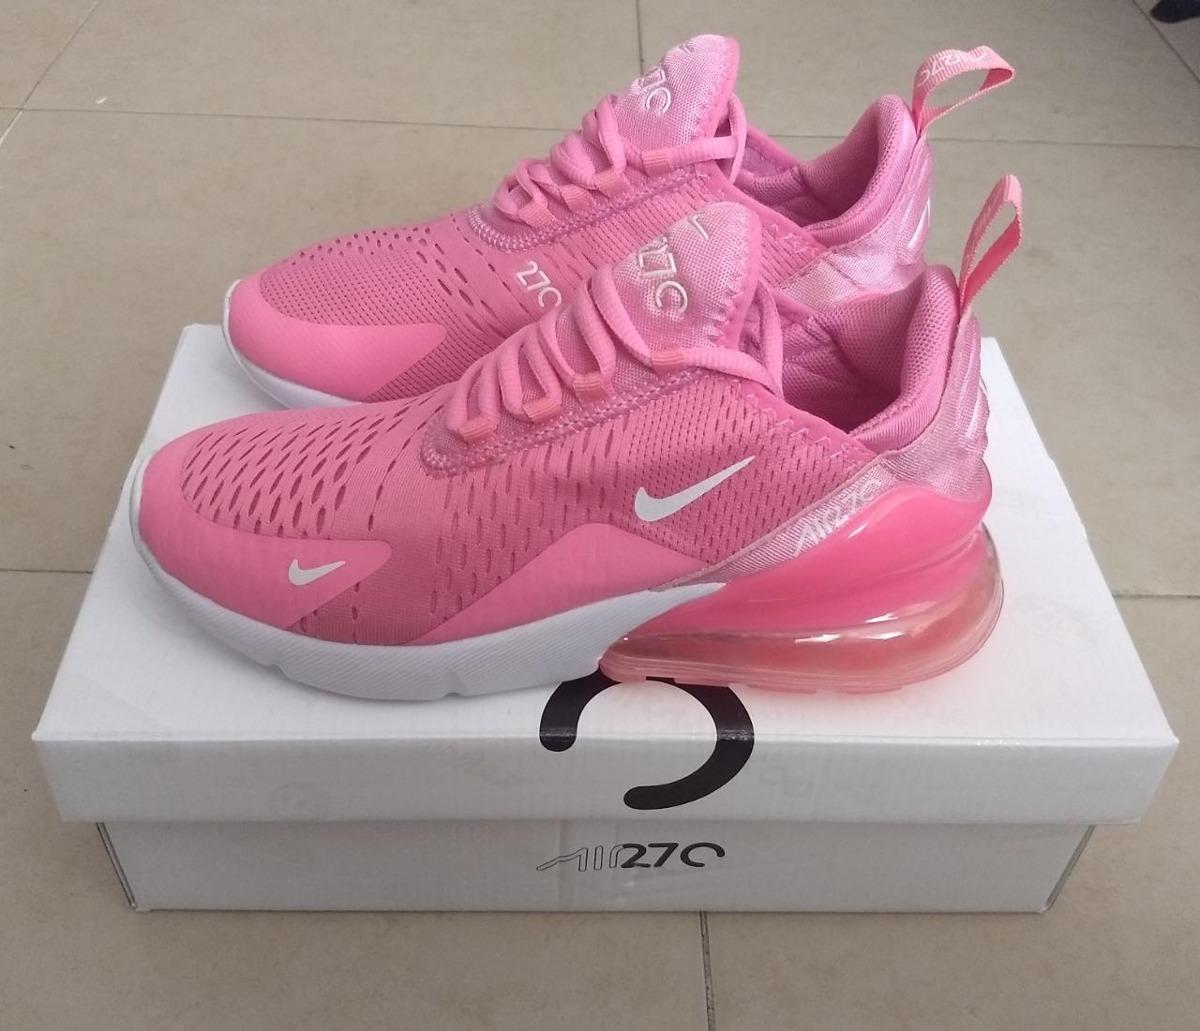 Características. Marca Nike  Modelo Airmax  Género Mujer  Estilo Tenis ... aff2ecff941d1